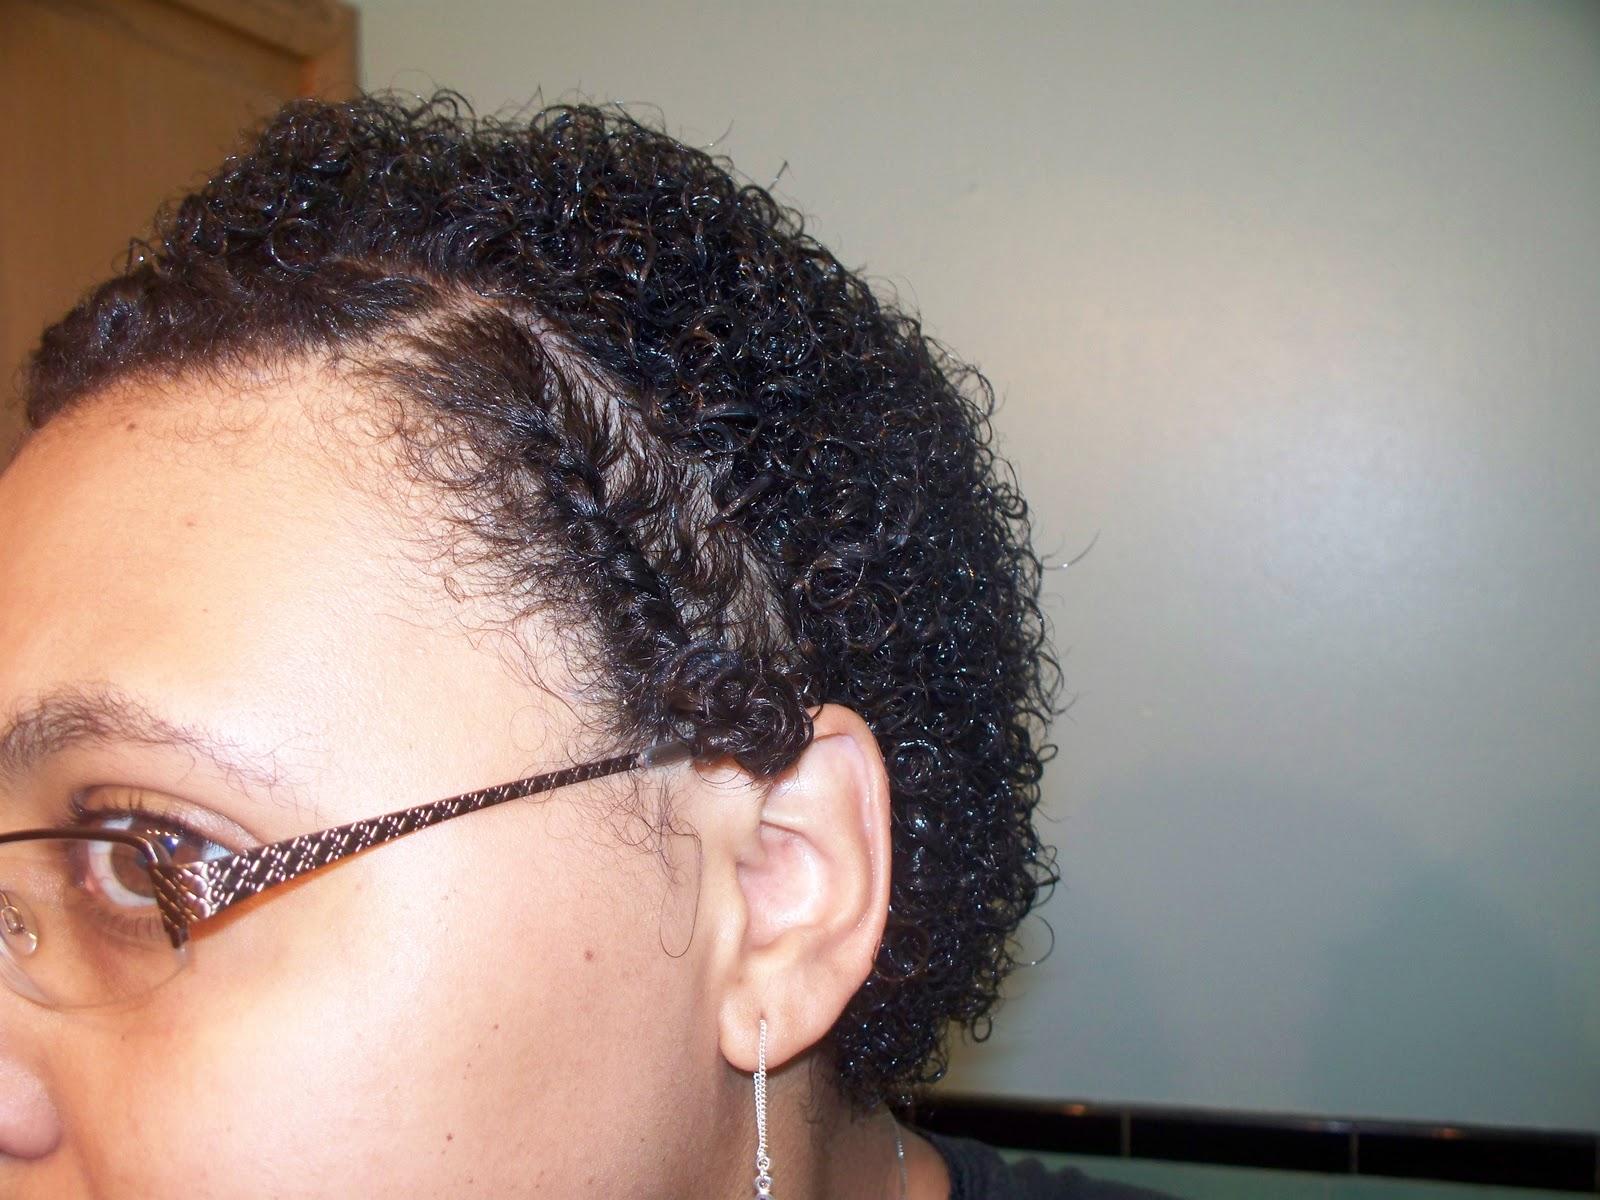 Bantu Knots Natural Hair Care